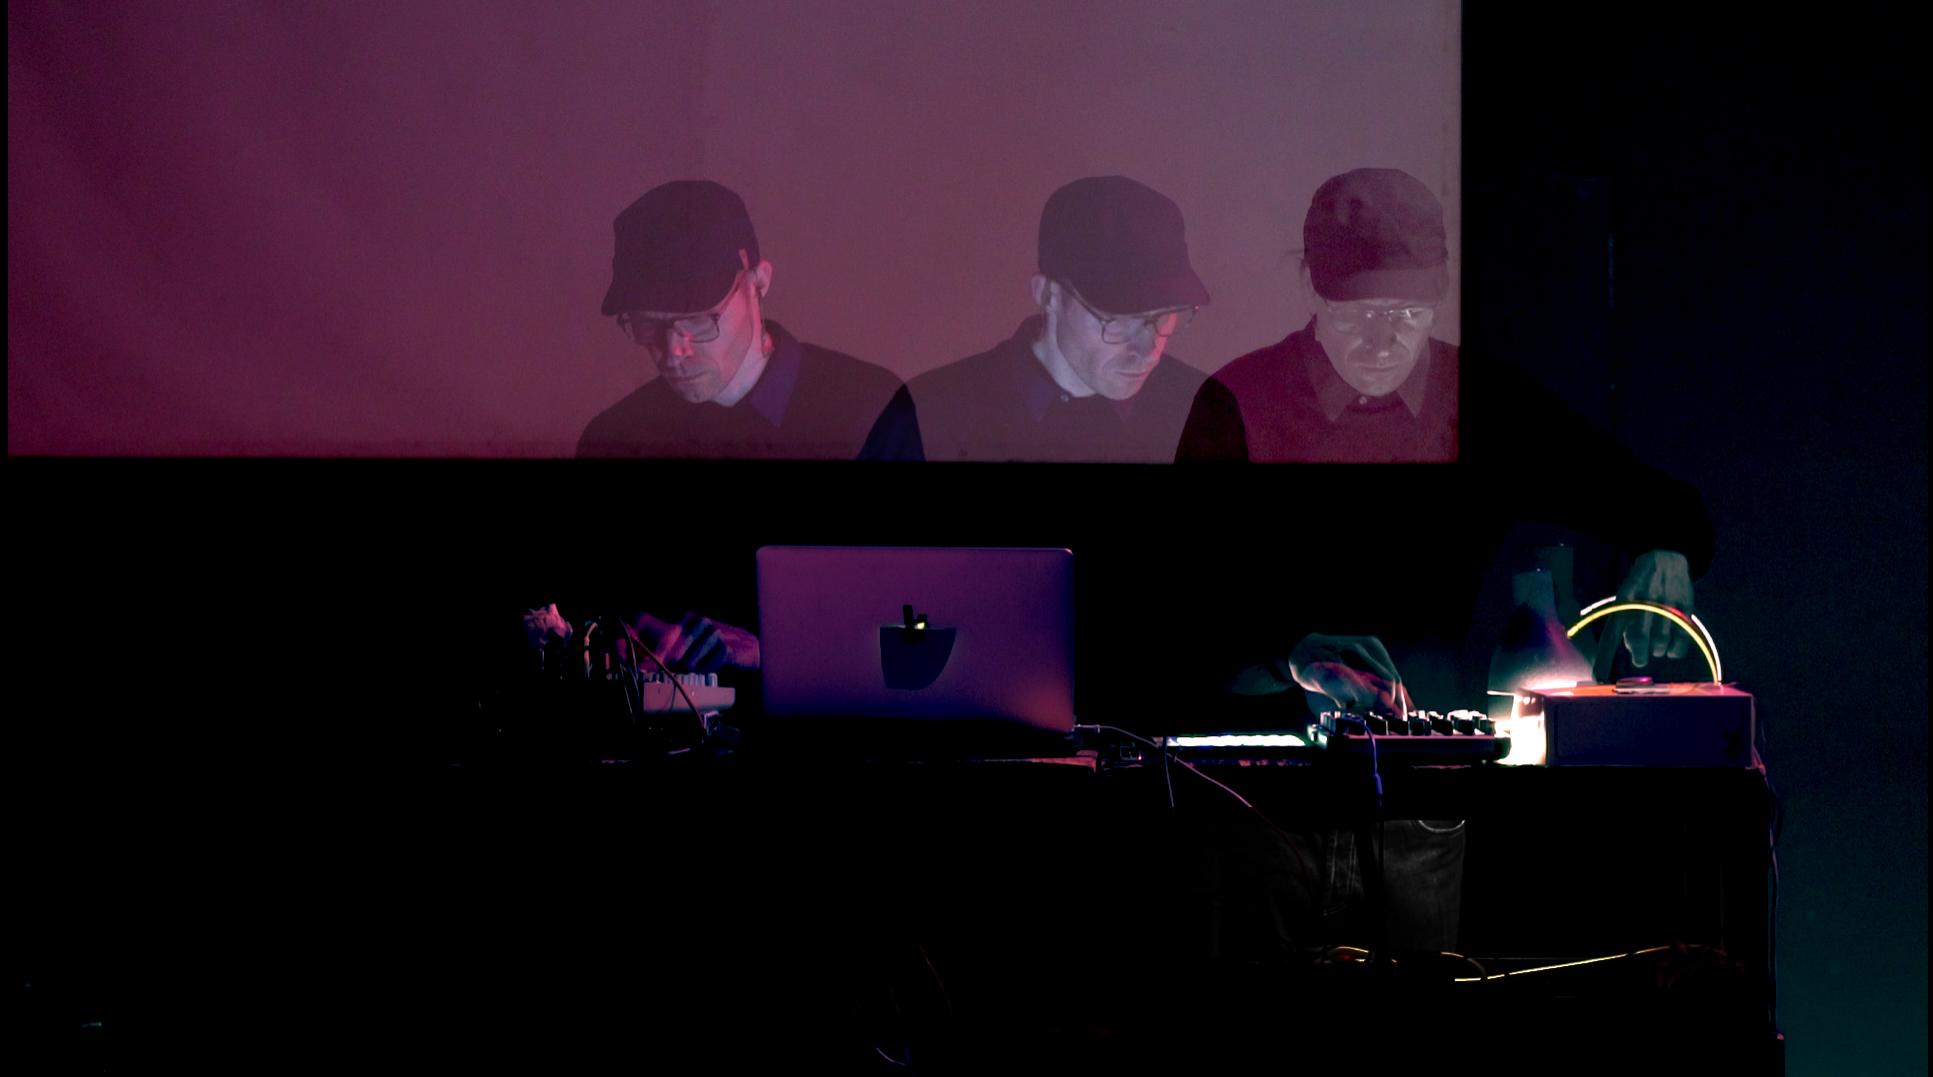 Boris Hegenbart @ labor sonor // filmed by Dafne Narvaez Berlfein